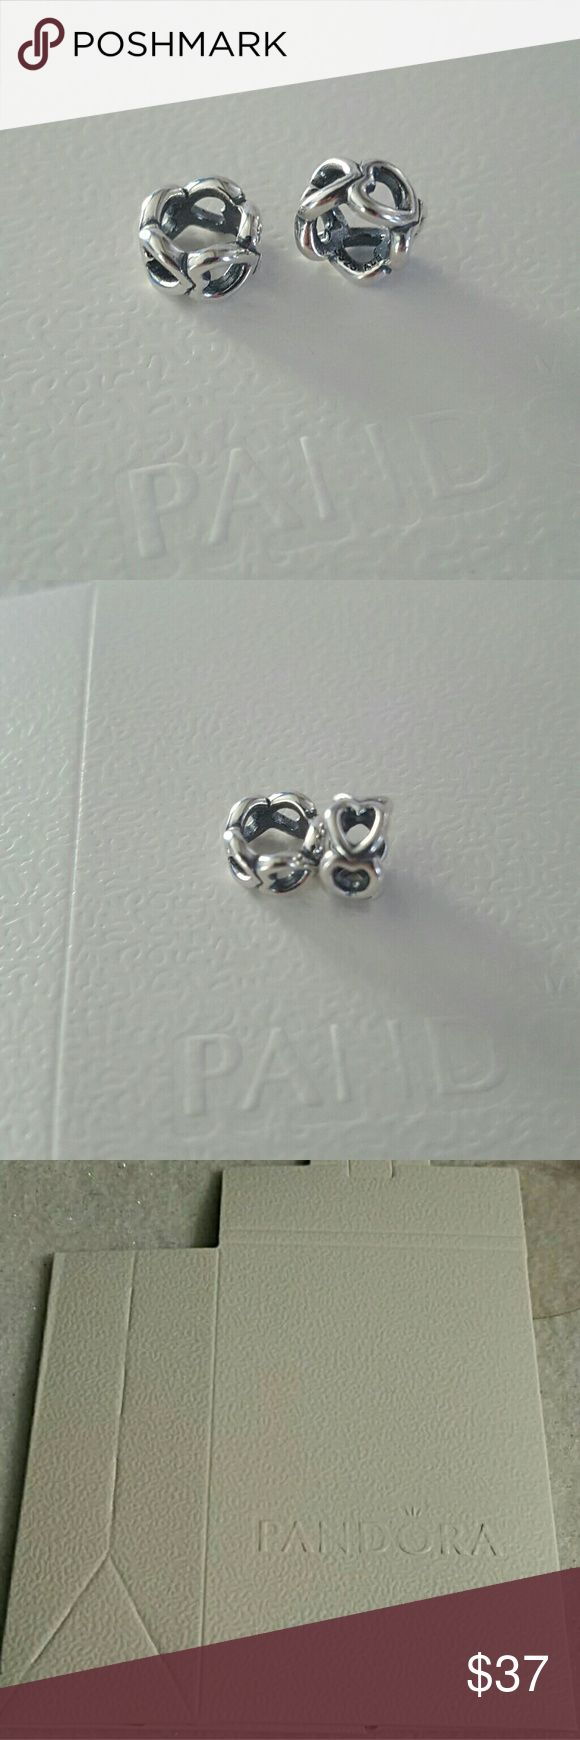 2pcs authentic pandora  open heart spacer 925 2pcs authentic pandora open heart spacer  925 steeling silver  stamped  Ale s925... Pandora Jewelry